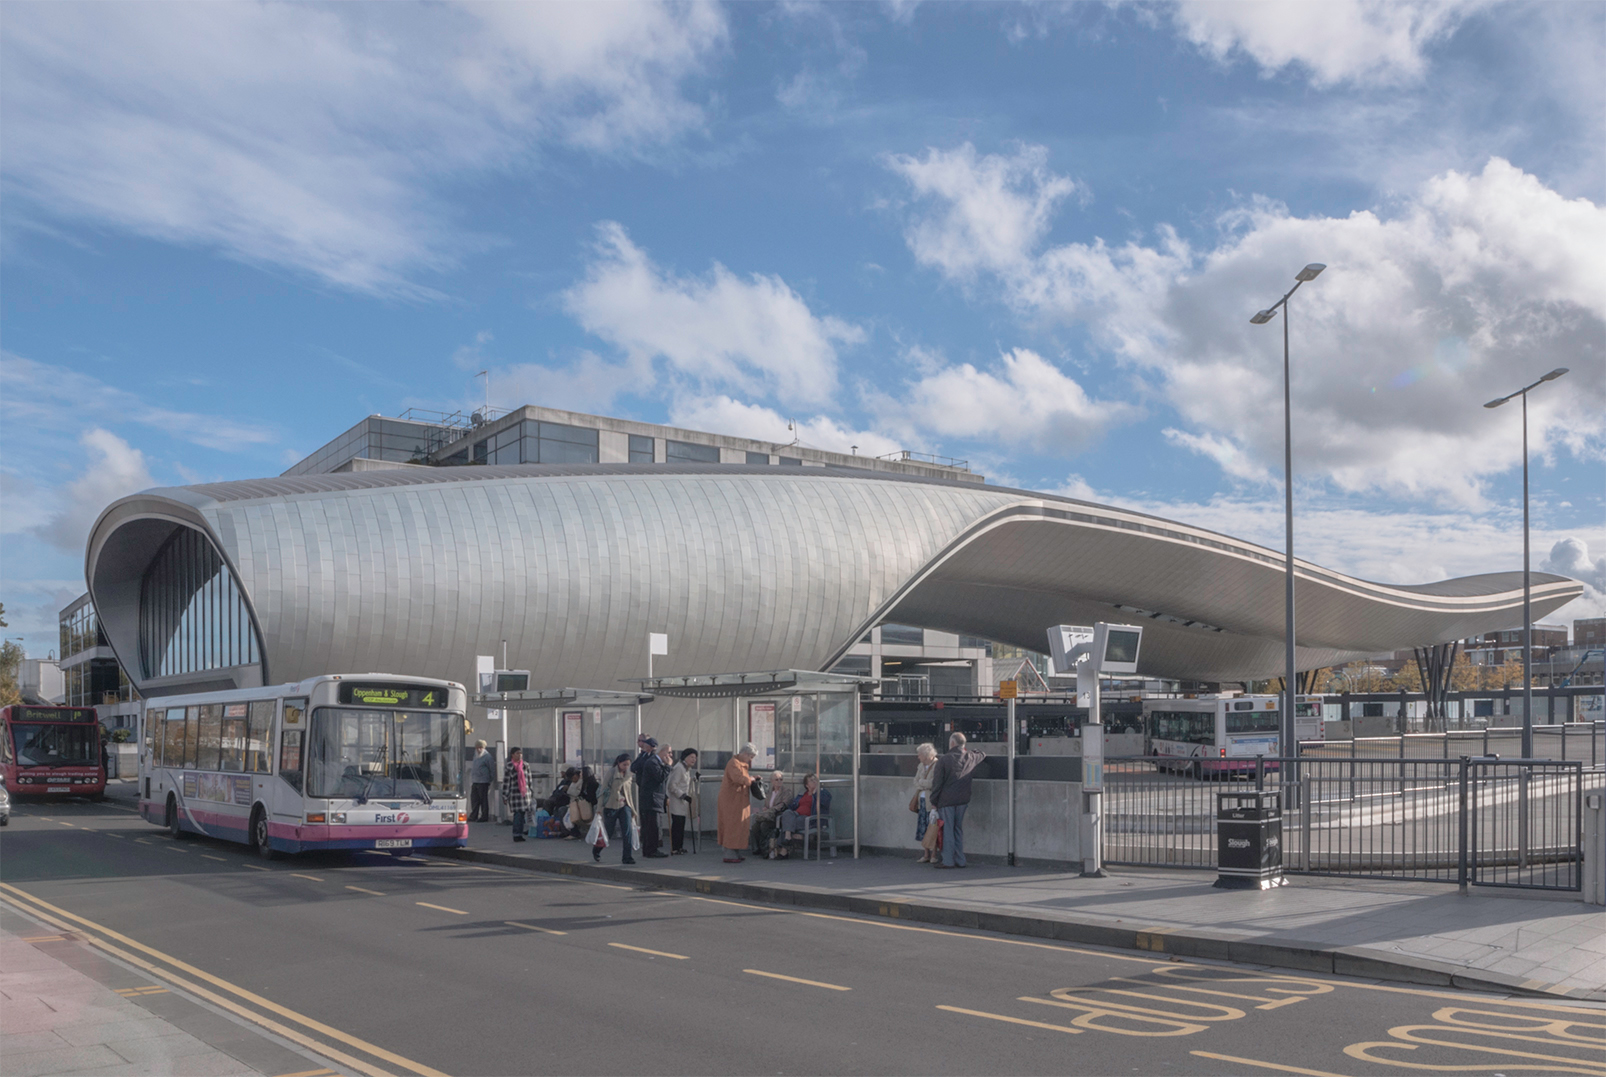 Slough Bus Station